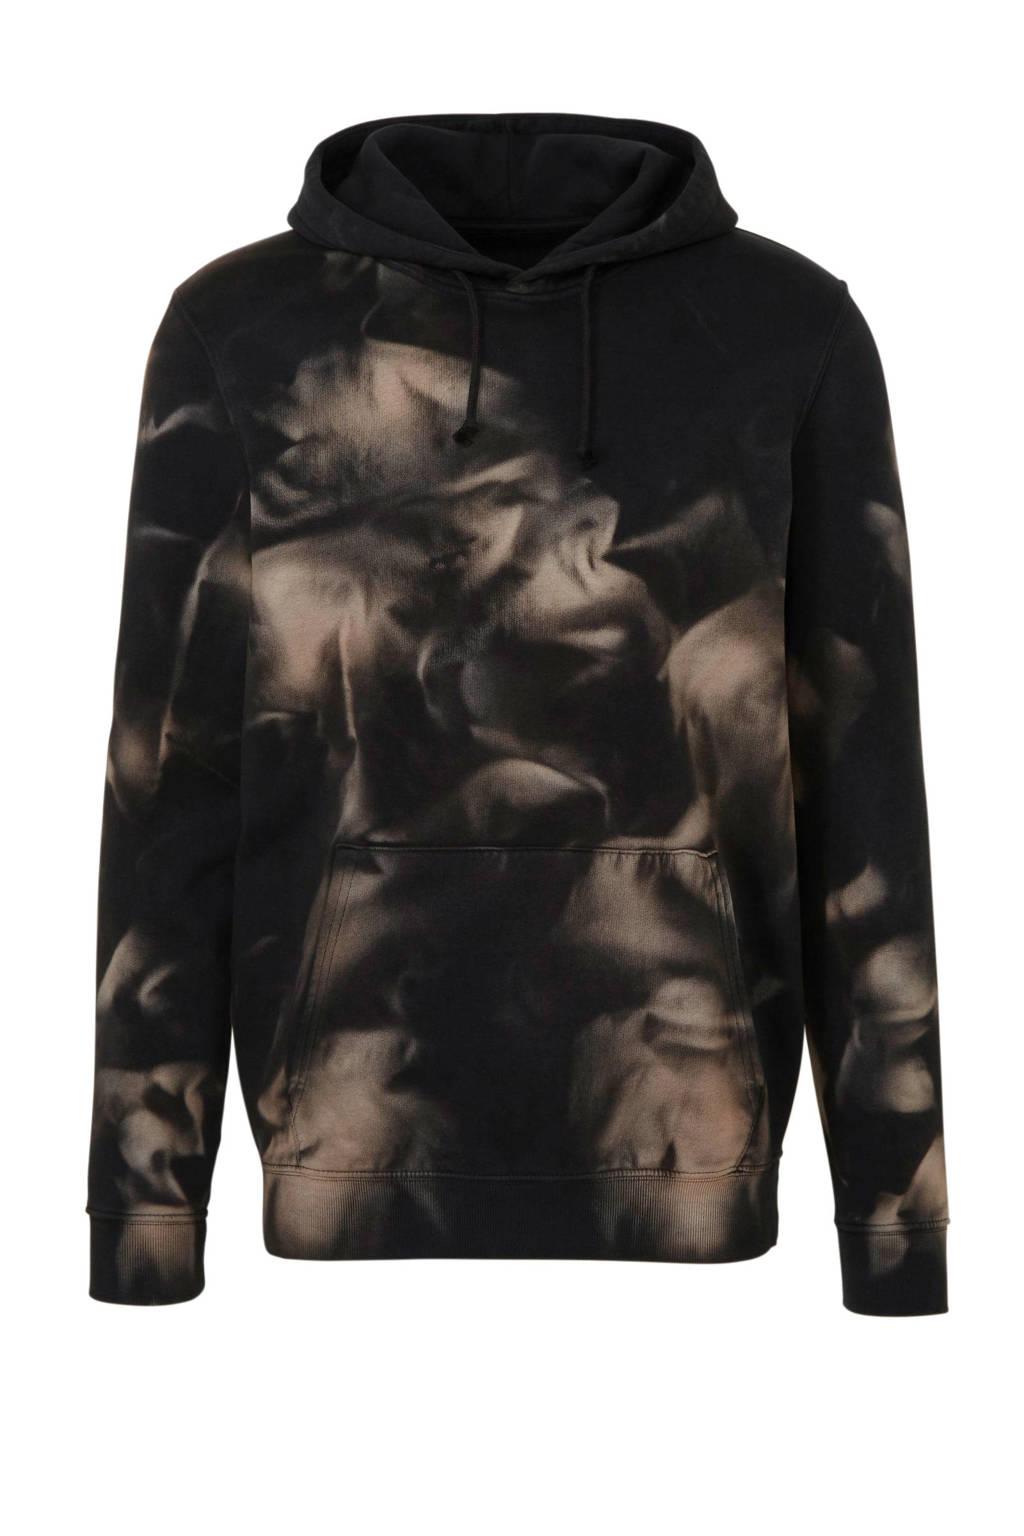 C&A Clockhouse hoodie met all over print bruin, Bruin